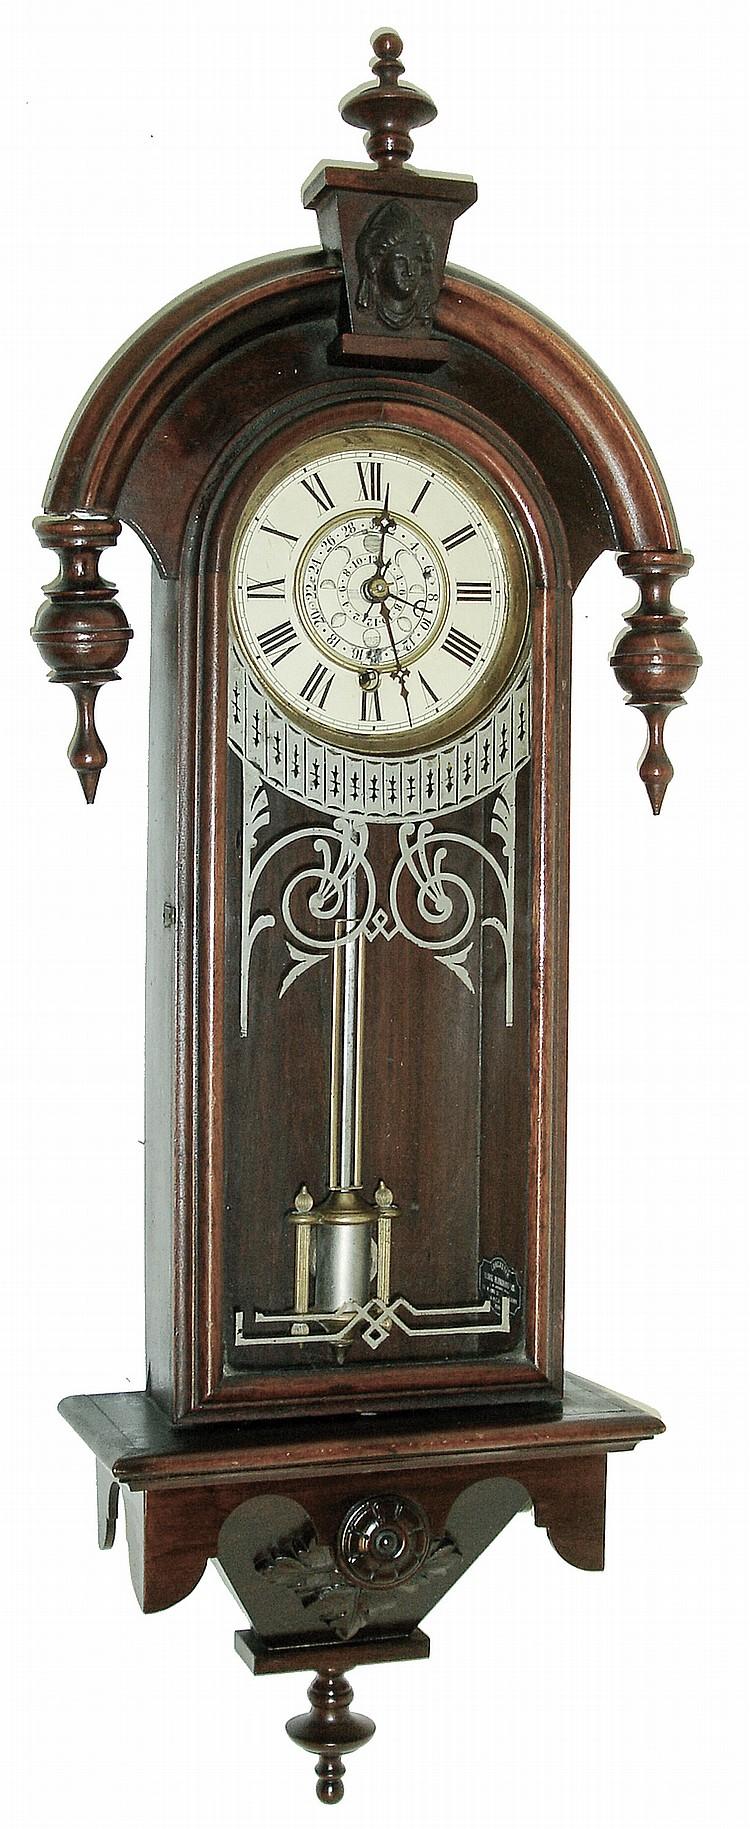 Gilbert Clock Identification